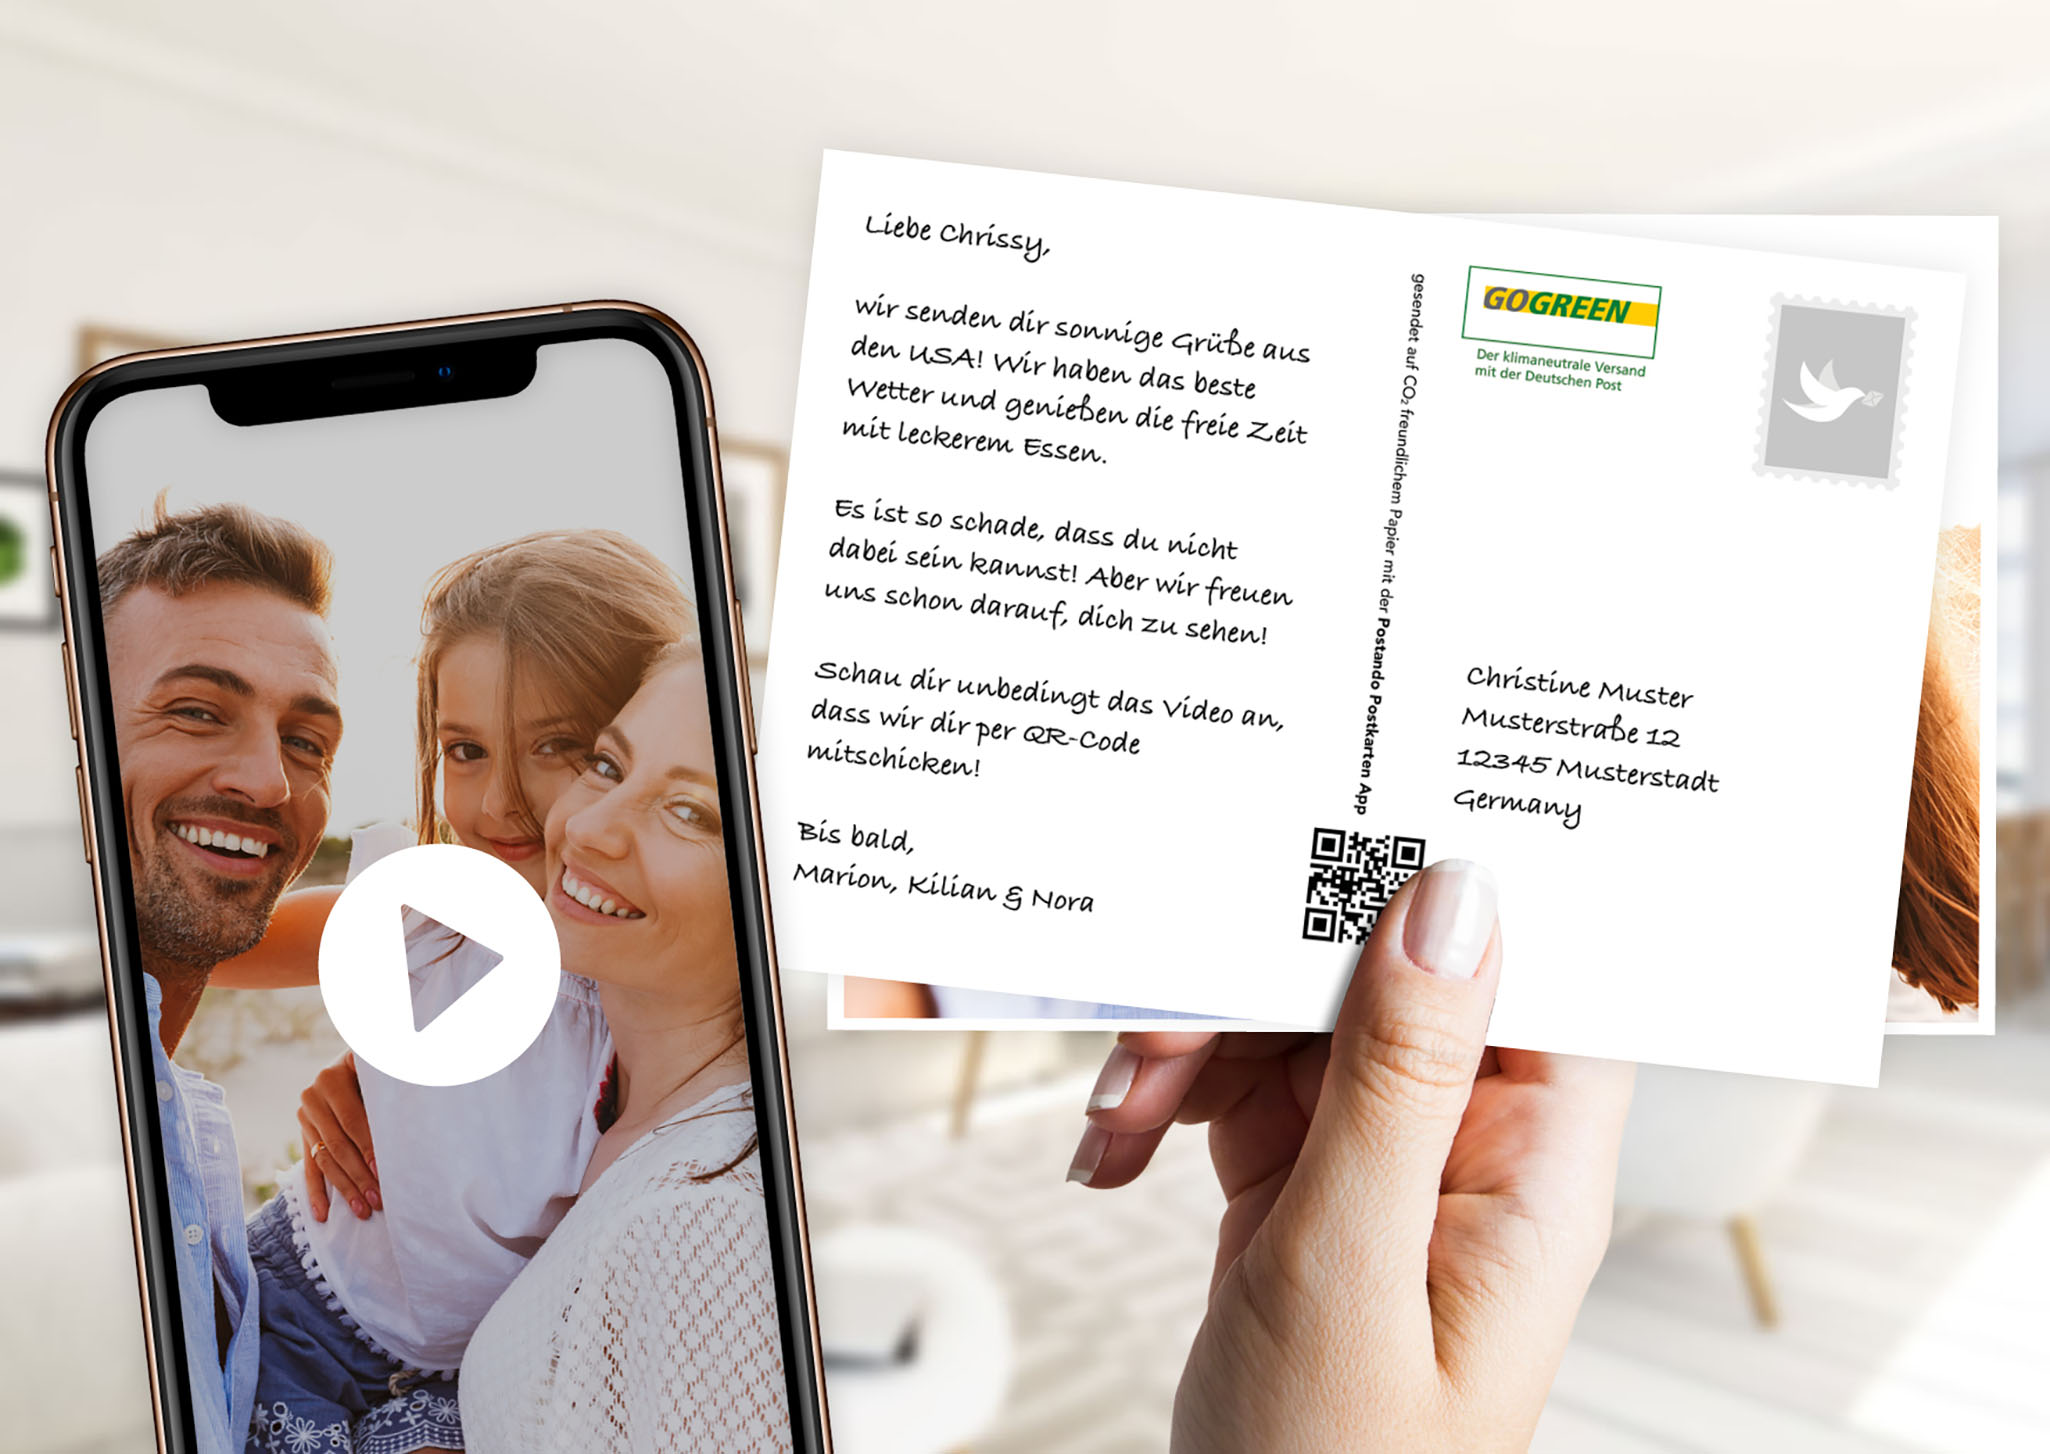 Postando: La carte postale avec un message vidéo